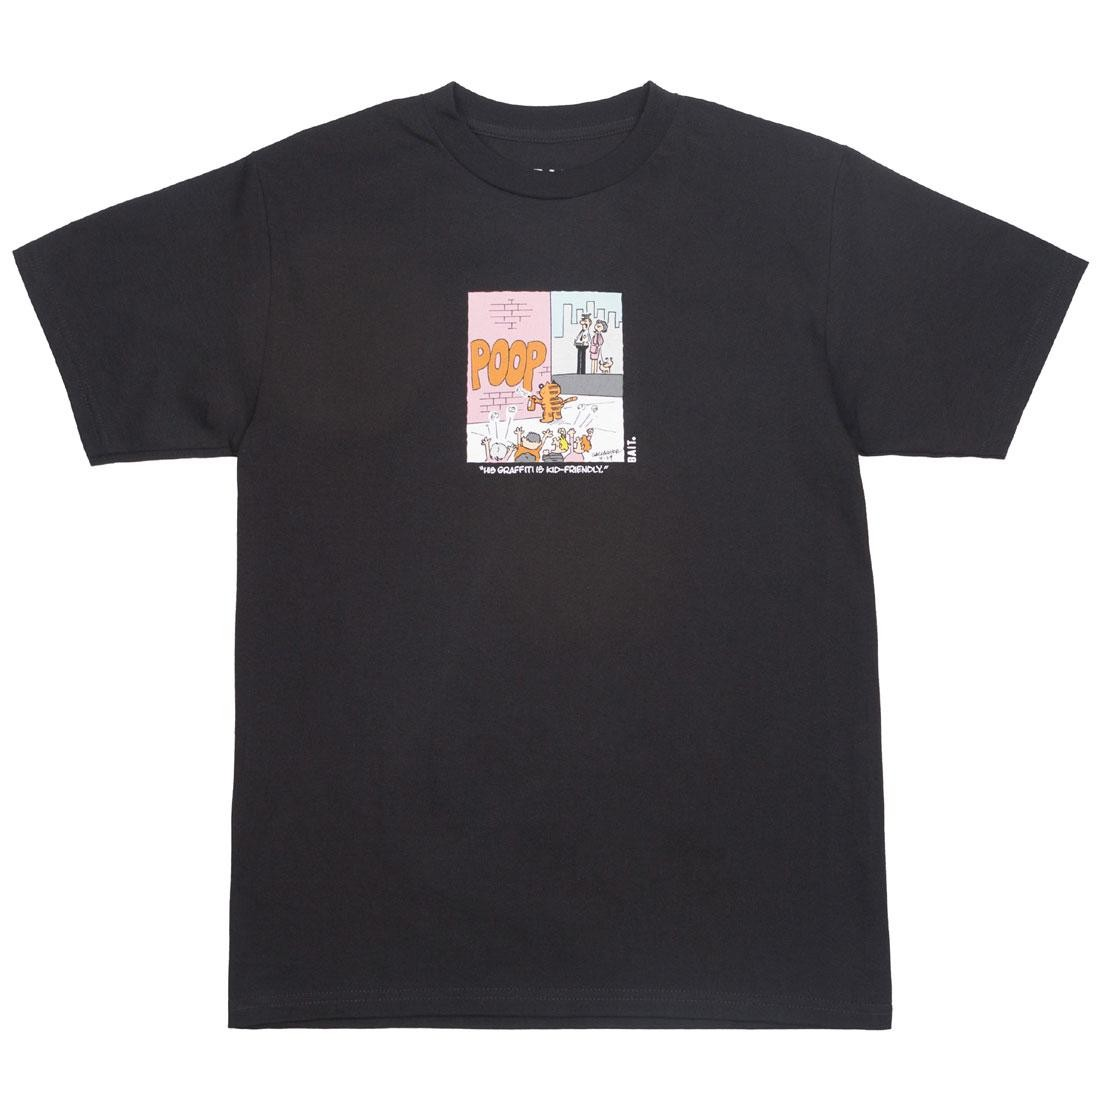 BAIT x Heathcliff Men His Graffiti Is Kid Friendly Tee (black)